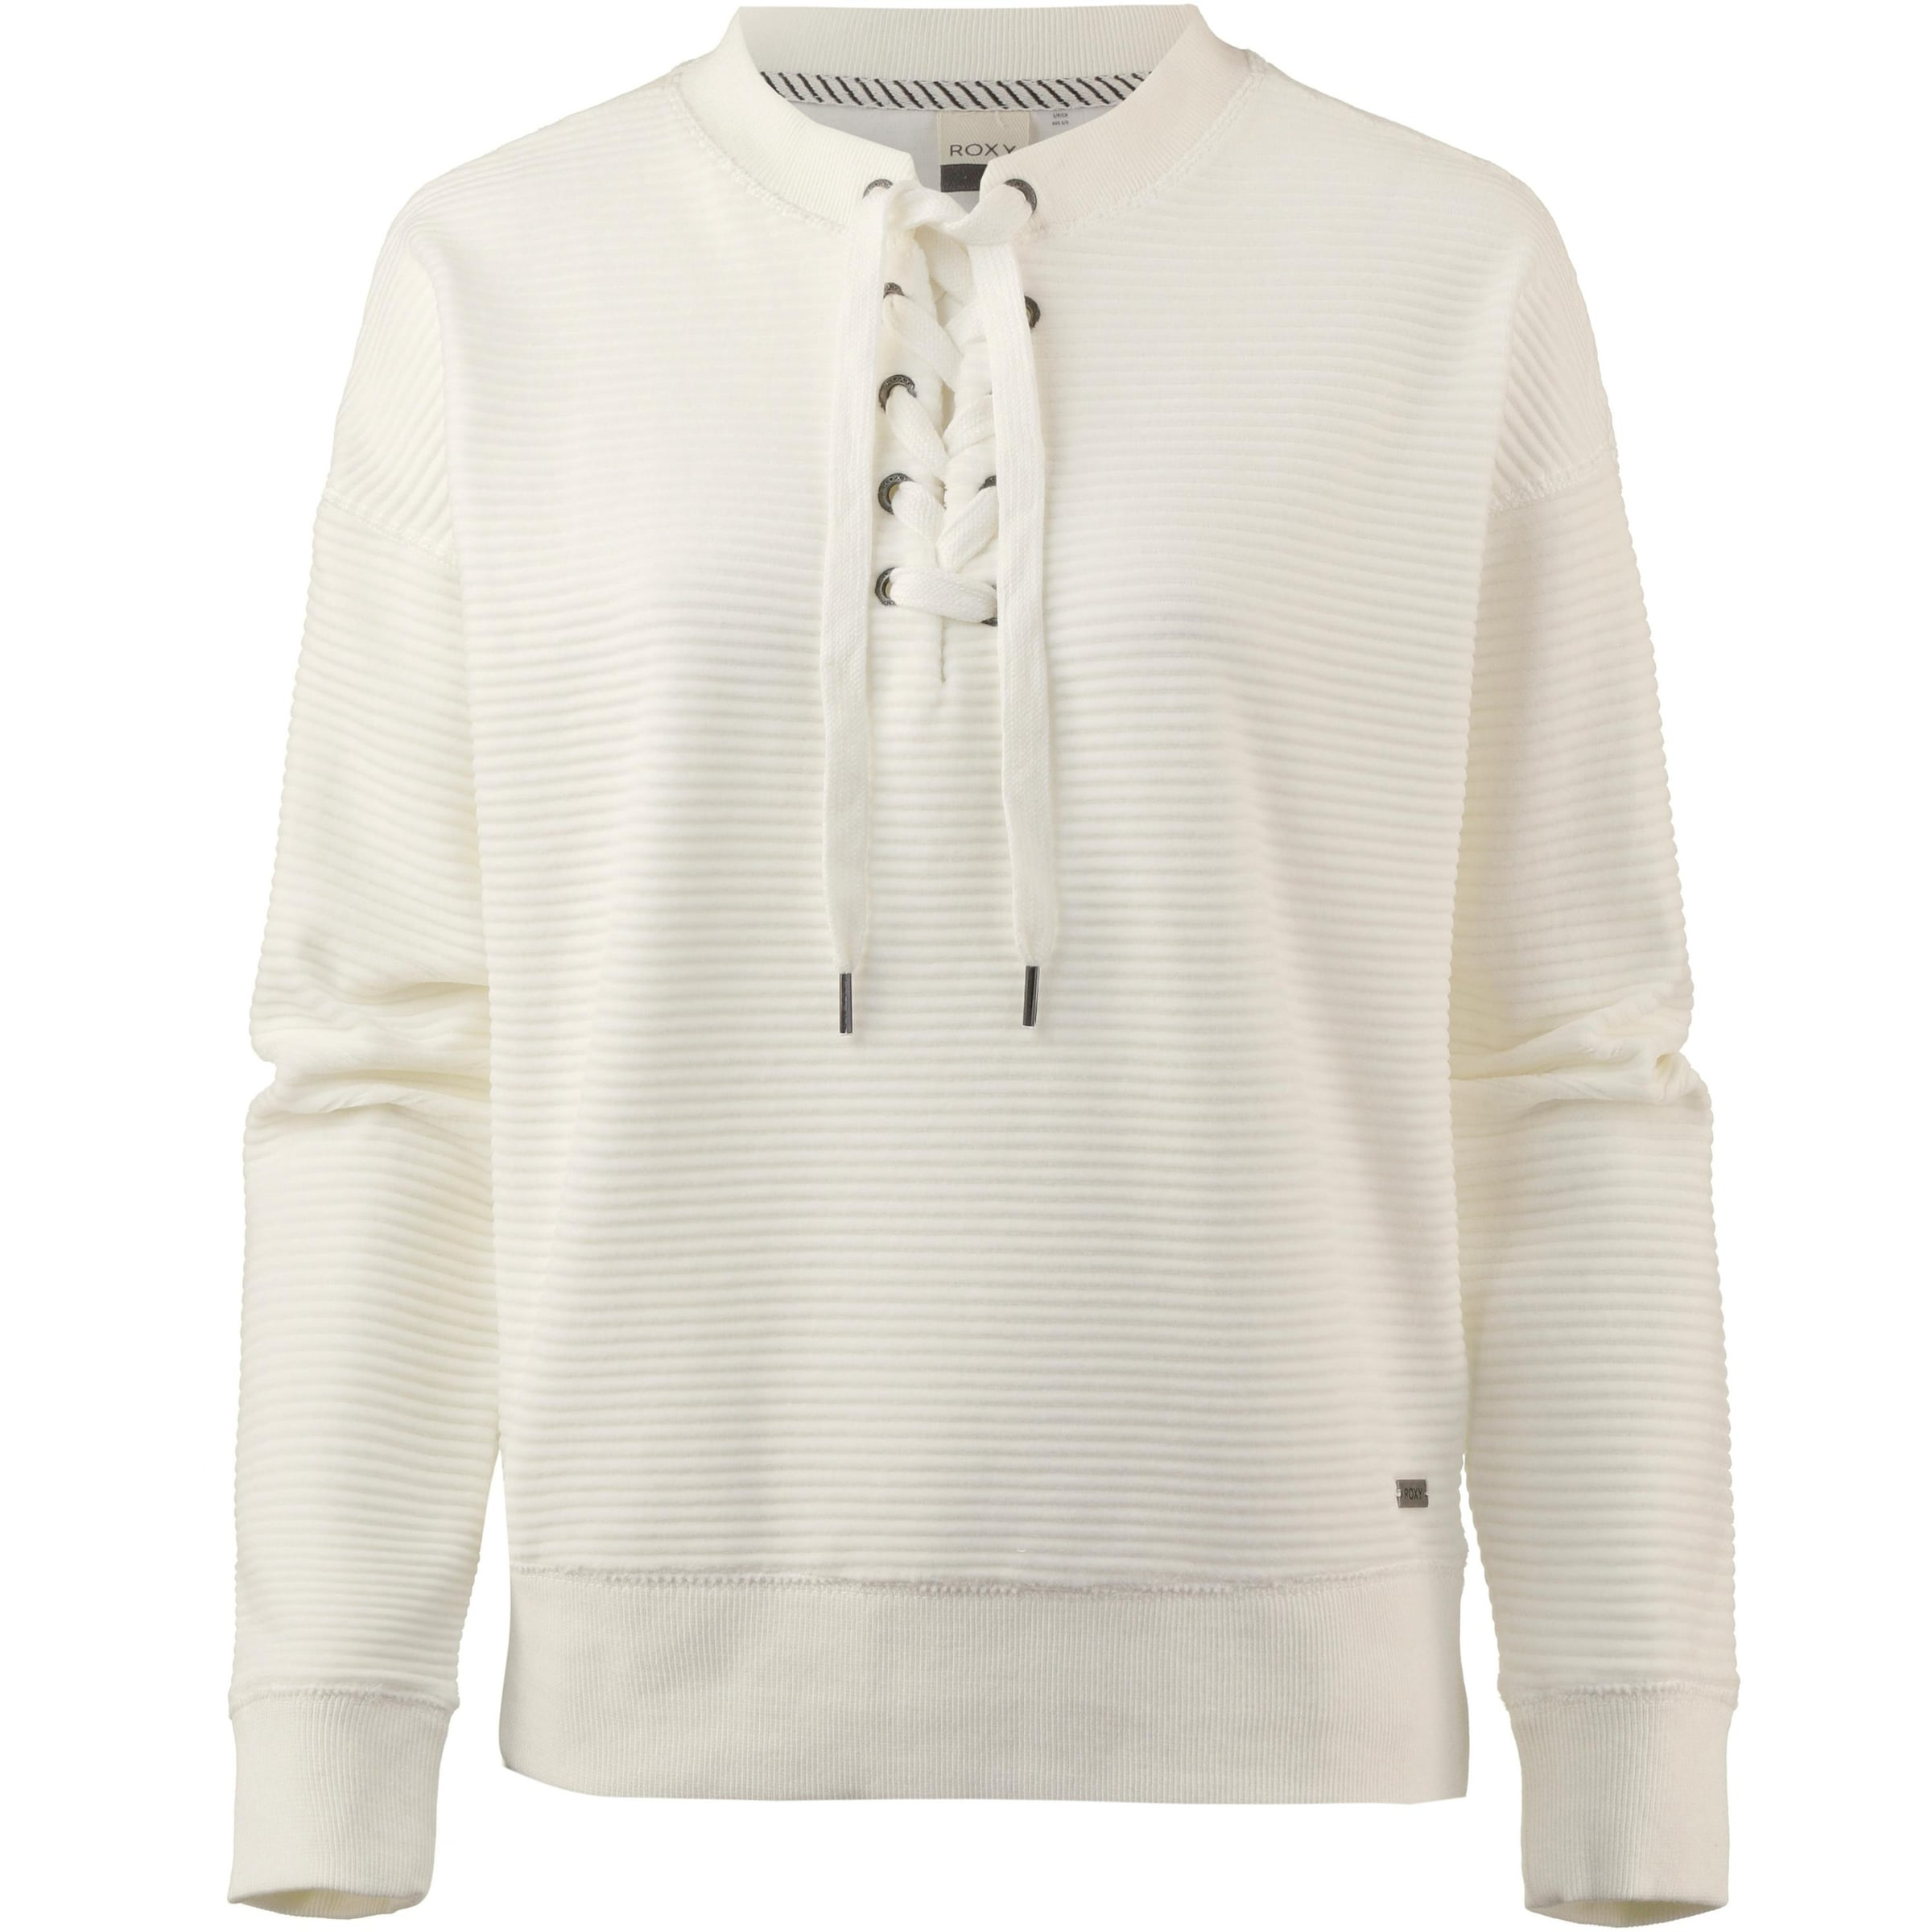 In In In Sweatshirt Sweatshirt Sweatshirt Perlweiß Perlweiß Roxy Roxy Perlweiß Roxy txsQBhrdC